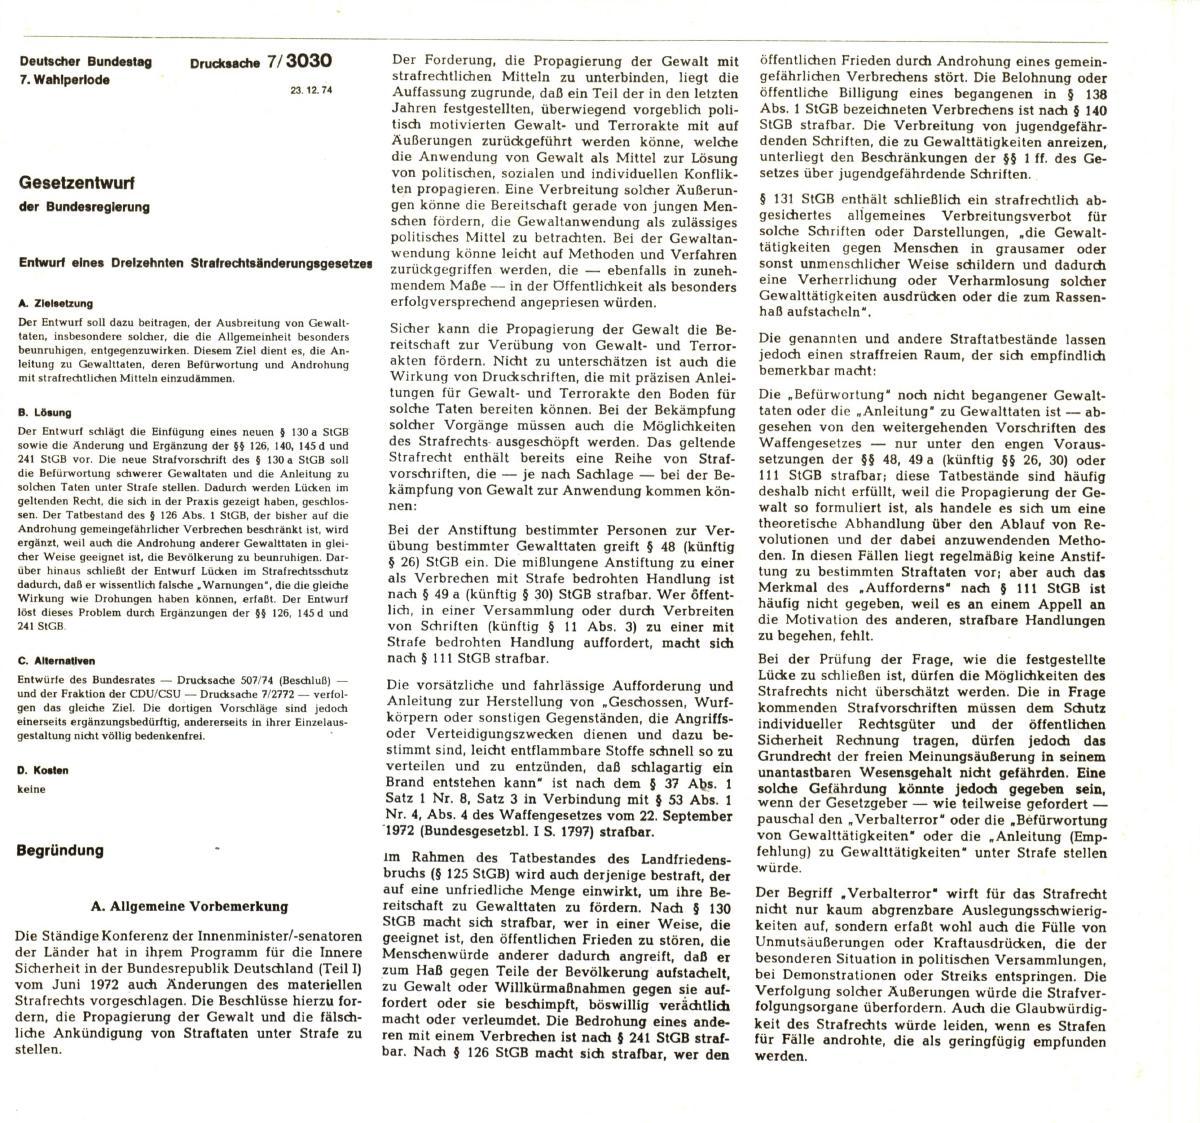 REP_VLB_1976_Die_Zensurgesetze_48